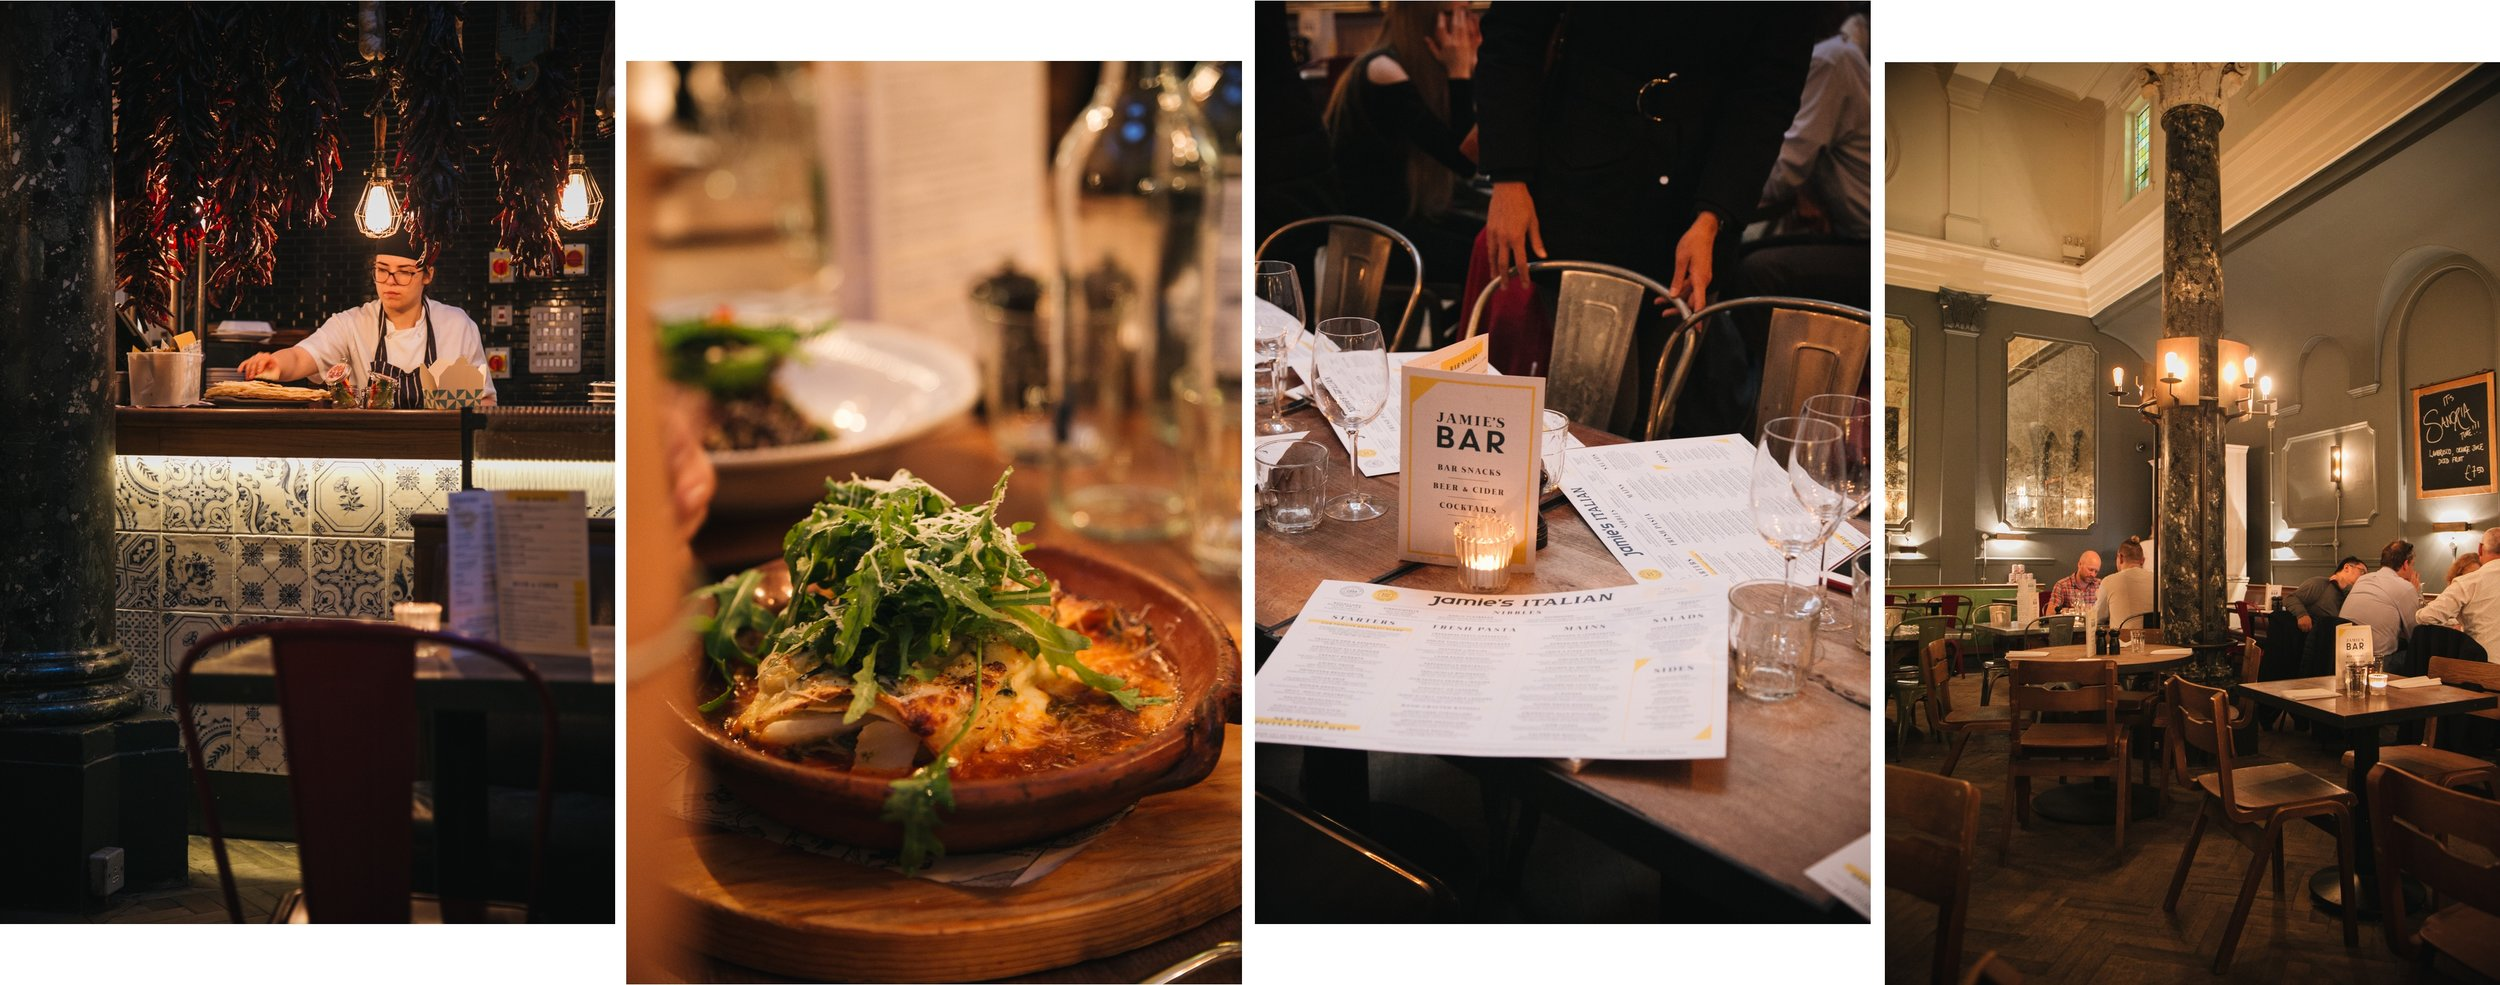 Jamie-oliver-italian-restaurant-cambridge.jpg